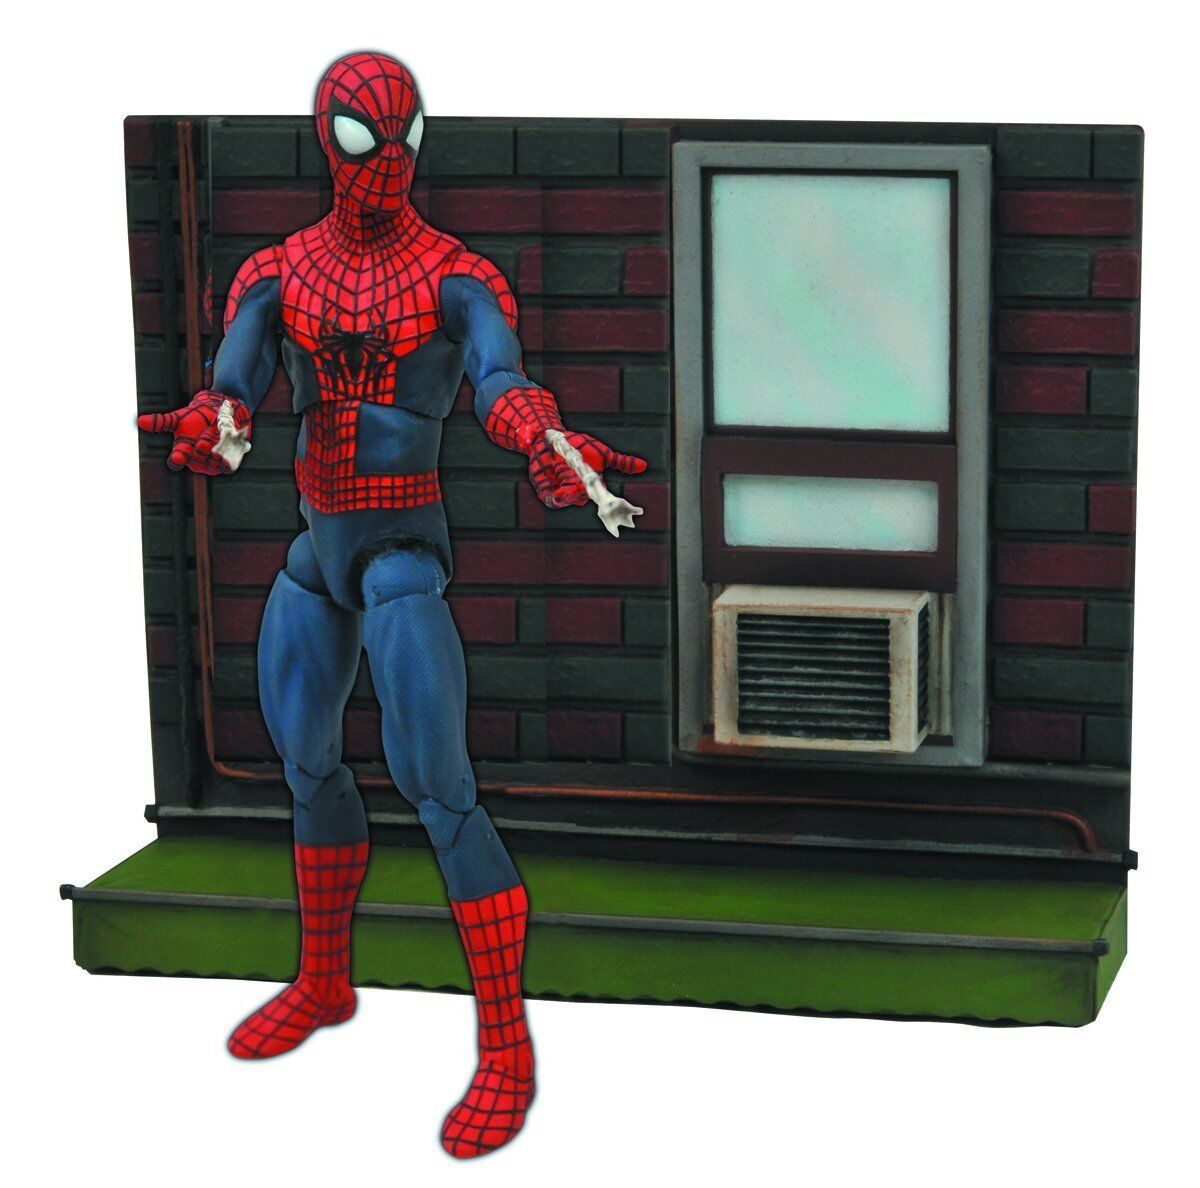 The Amazing Spider-Man Spider-Man Spider-Man 2 Movie Marvel Select Action Figure Diamond UK Seller a2568d